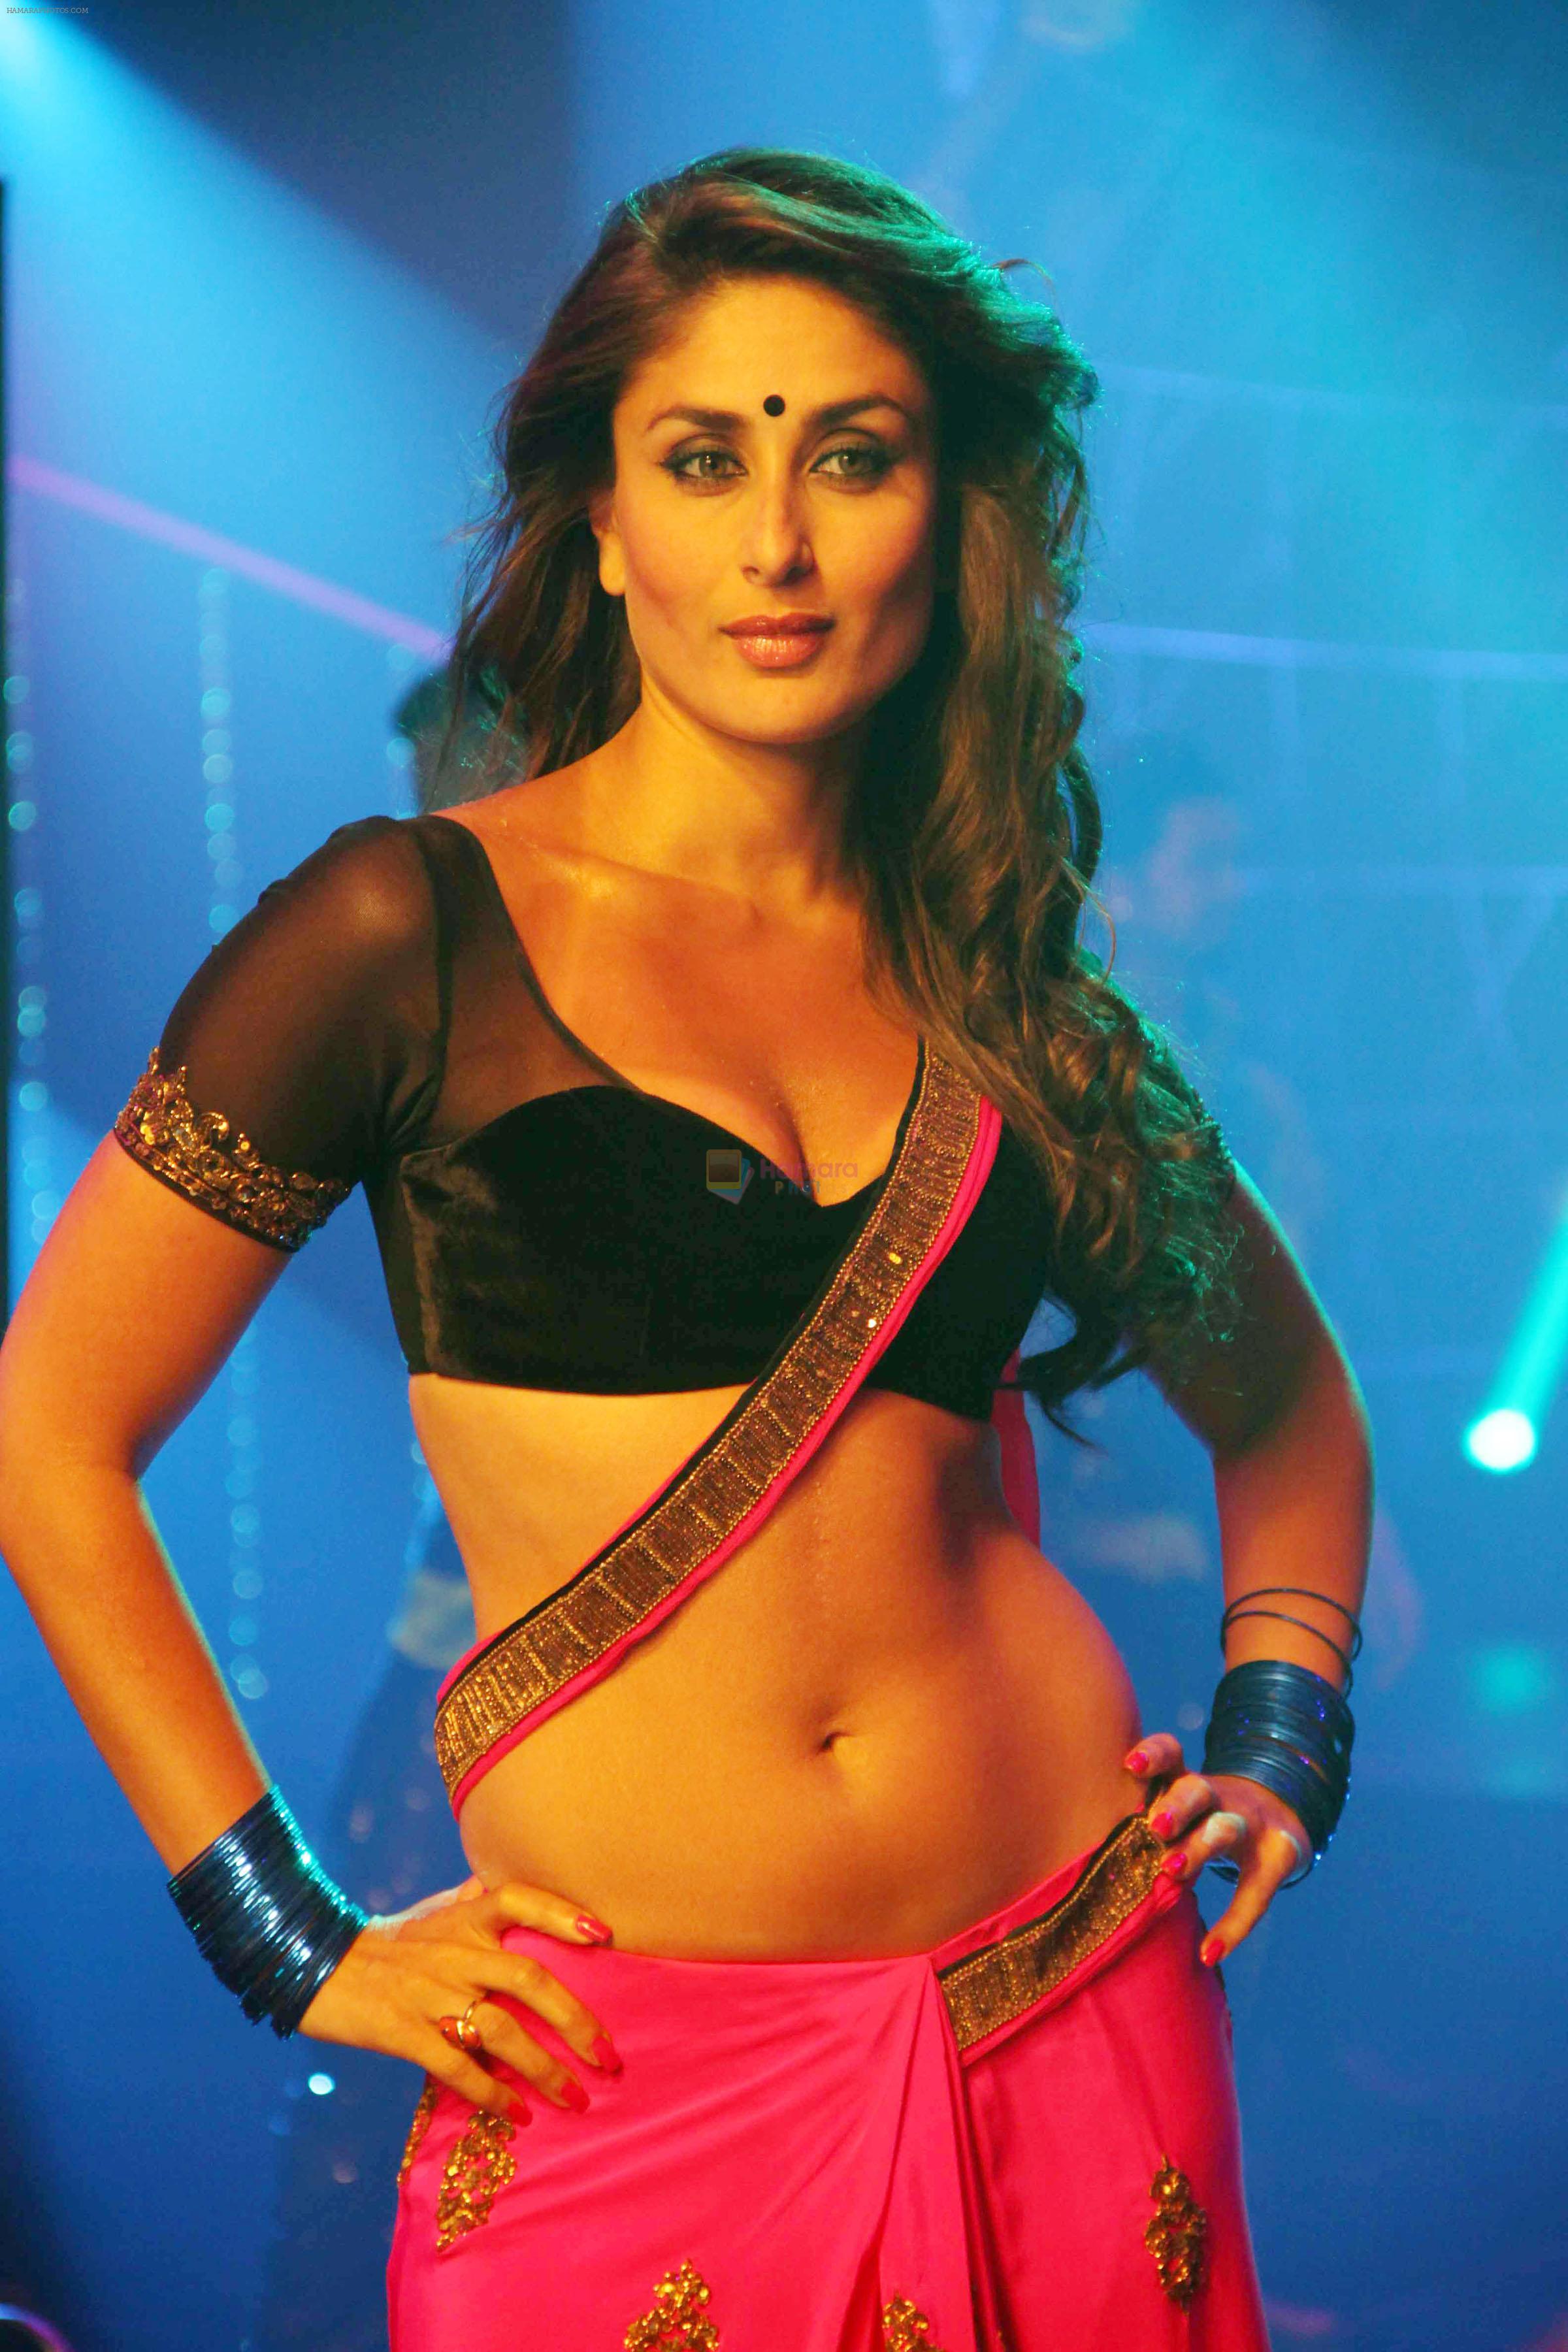 kareena kapoor in the song halkat jawani from the film heroine